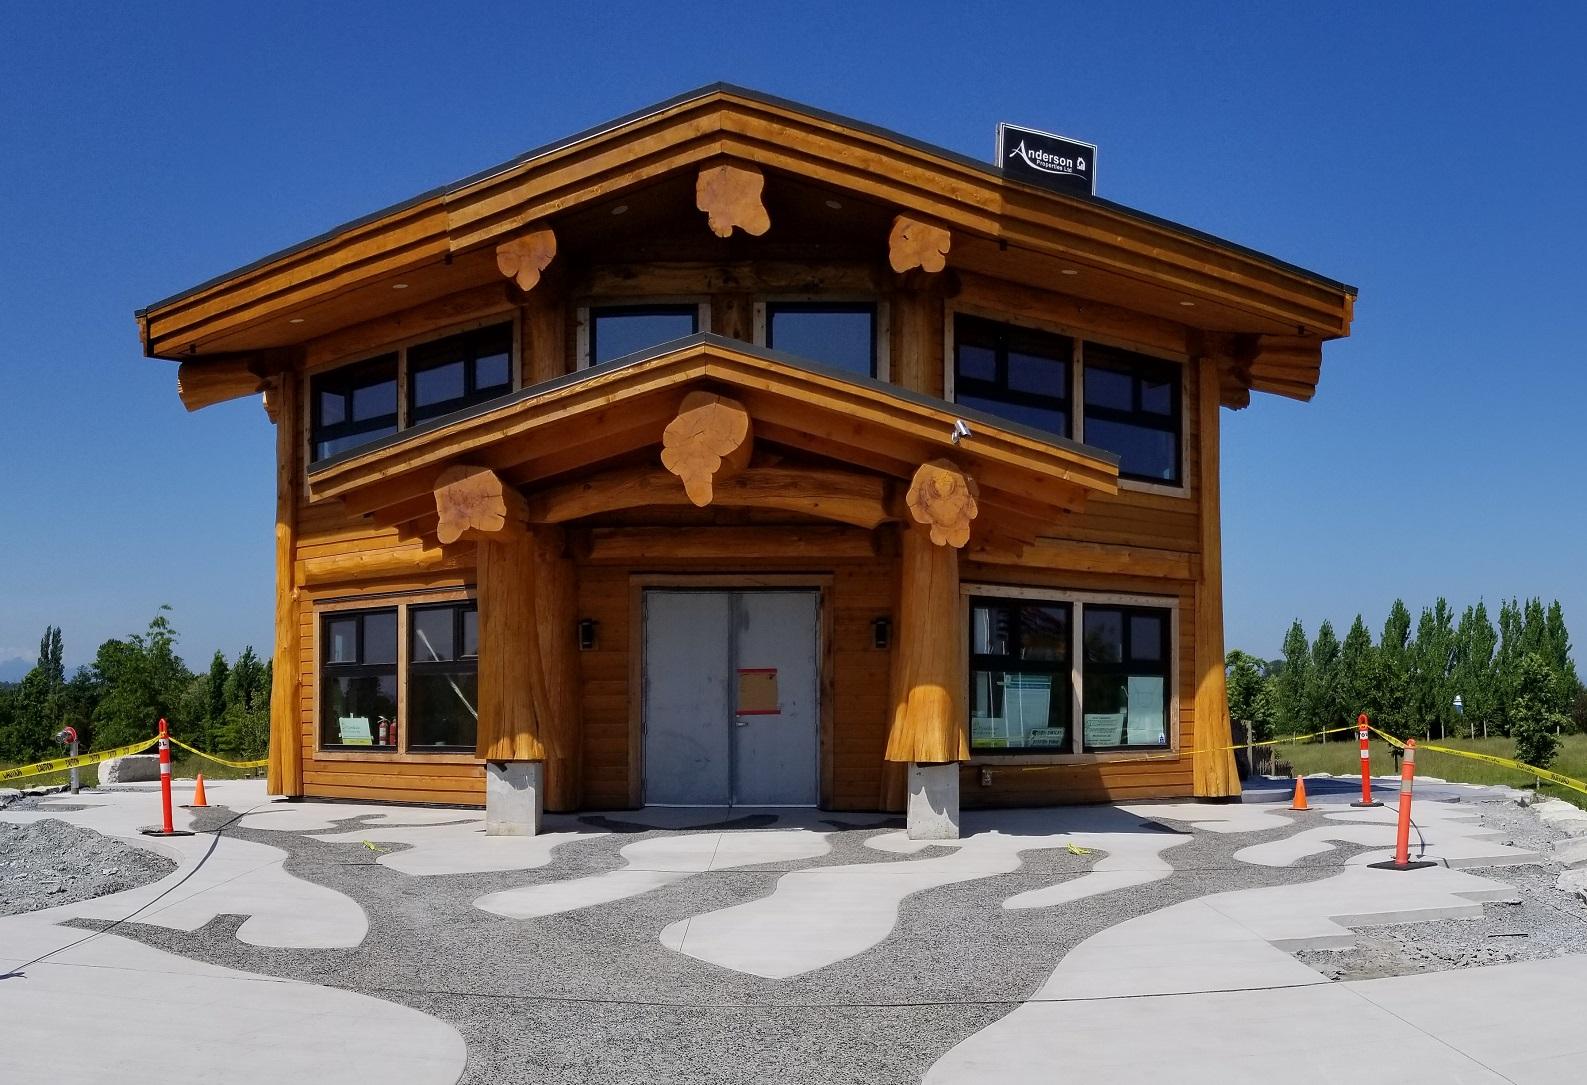 Rotary Interpretive Centre Opens at Derek Doubleday Arboretum June 22nd